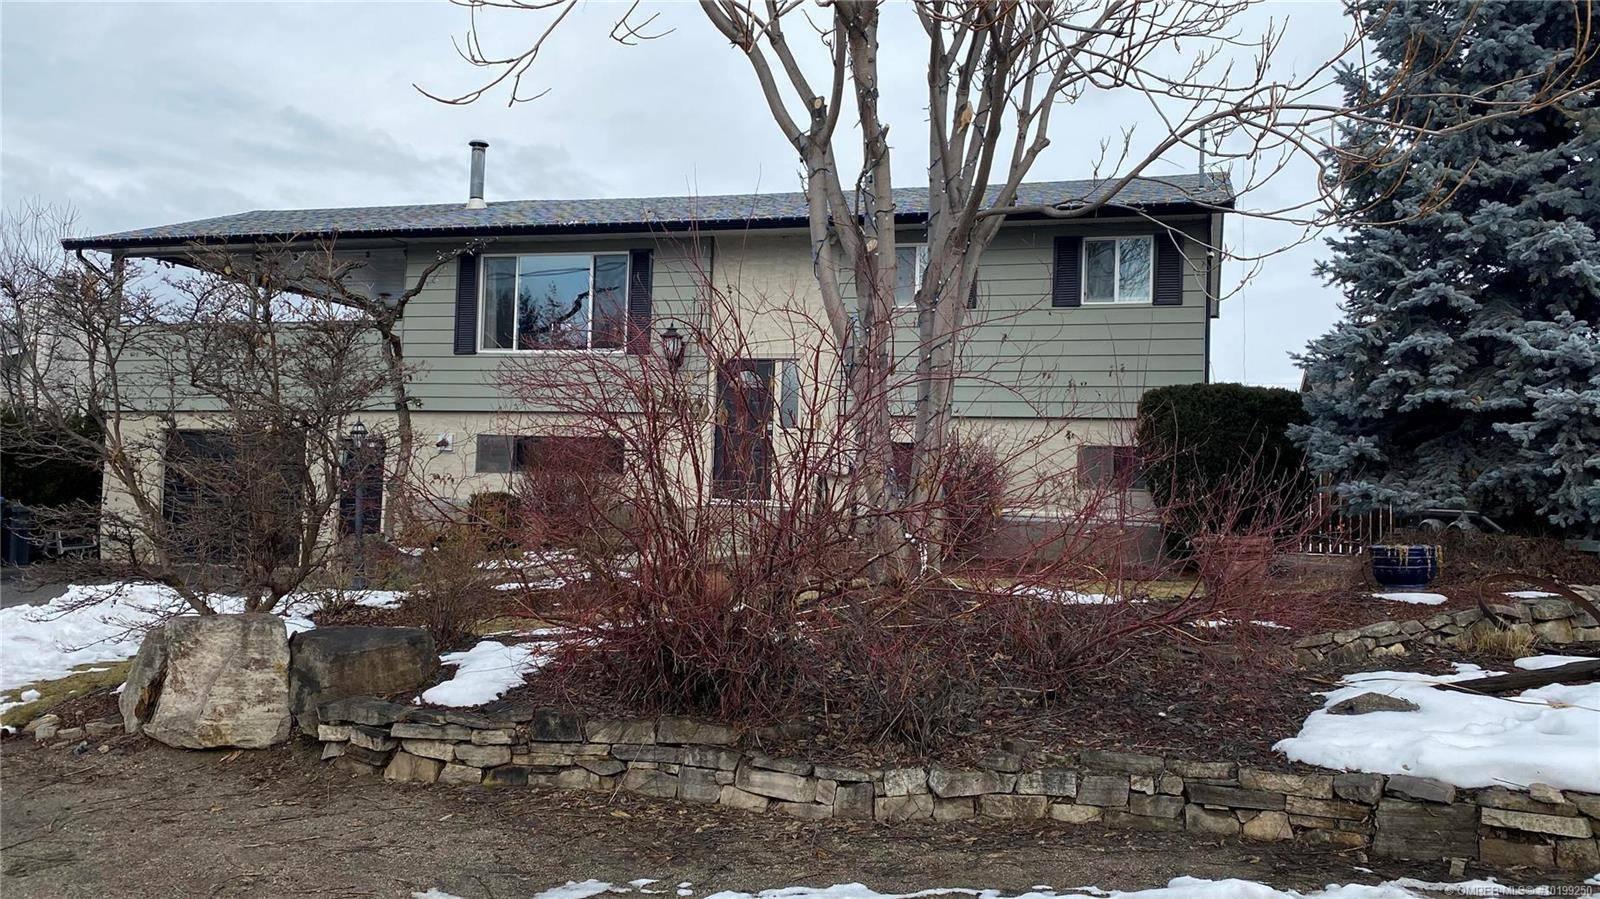 House for sale at 440 Peck Rd Kelowna British Columbia - MLS: 10199250